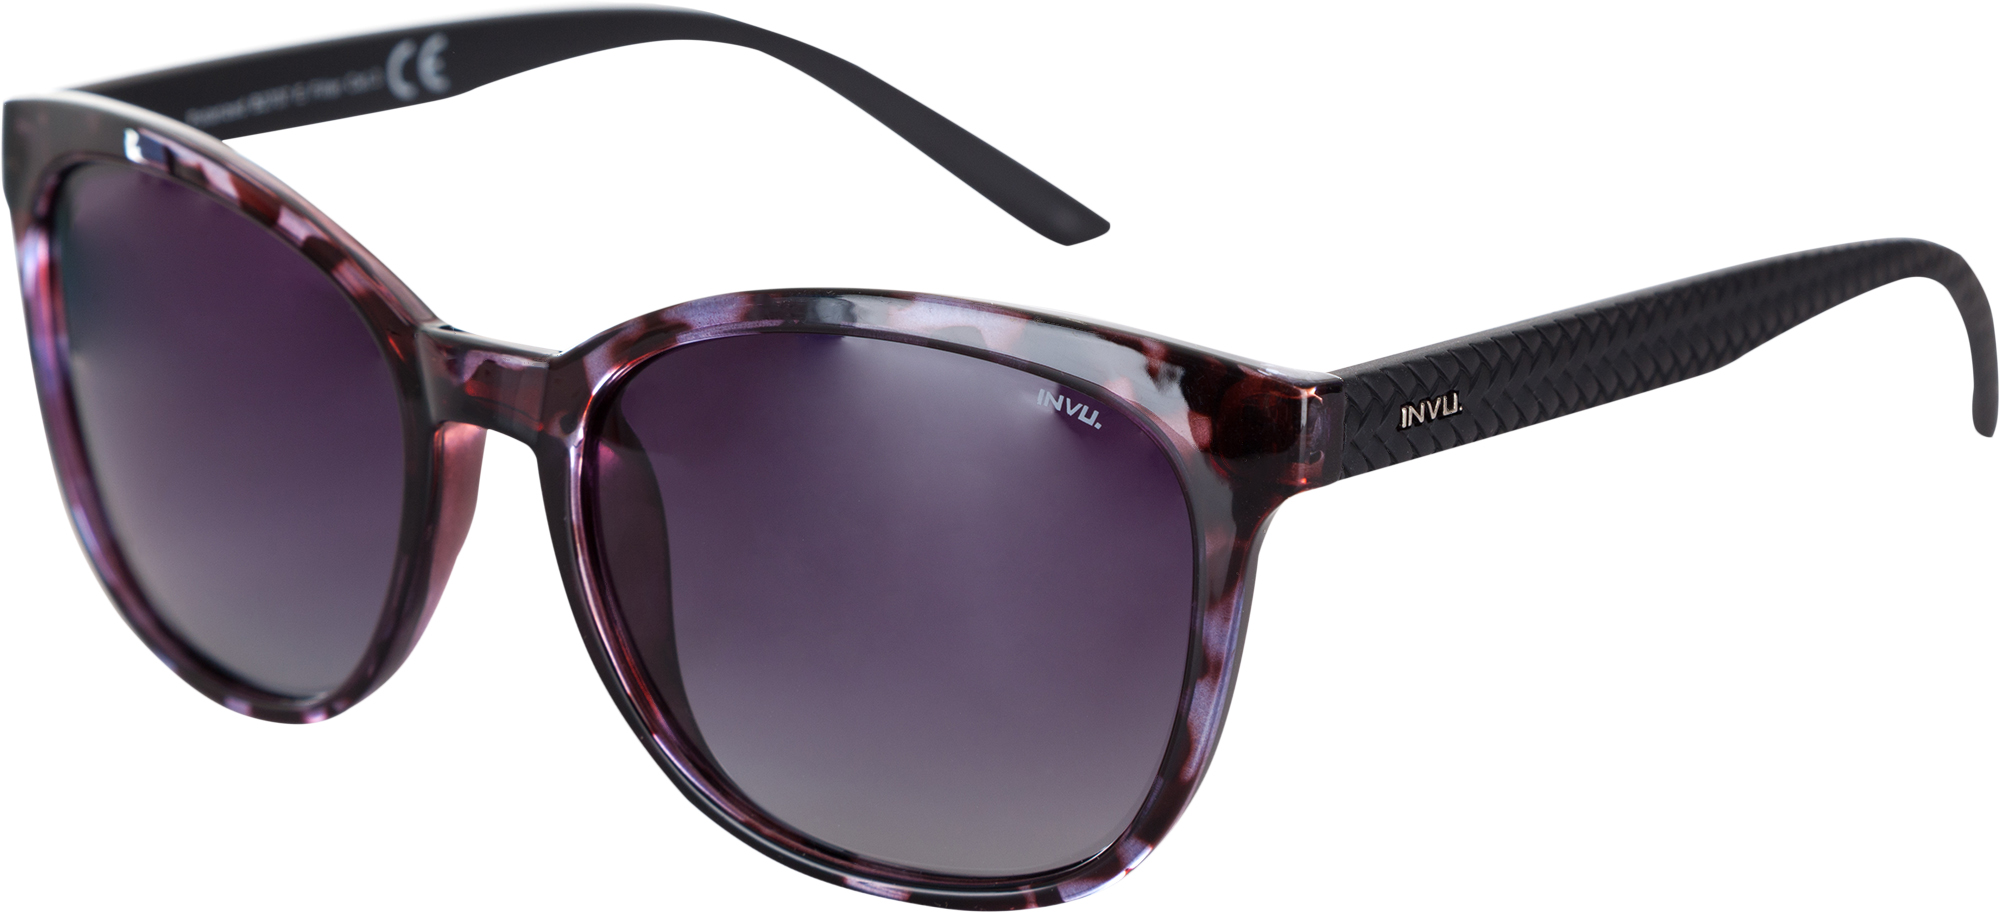 Invu Солнцезащитные очки женские Invu солнцезащитные очки tehmoda очки tm0025 g 6 sk skateboard